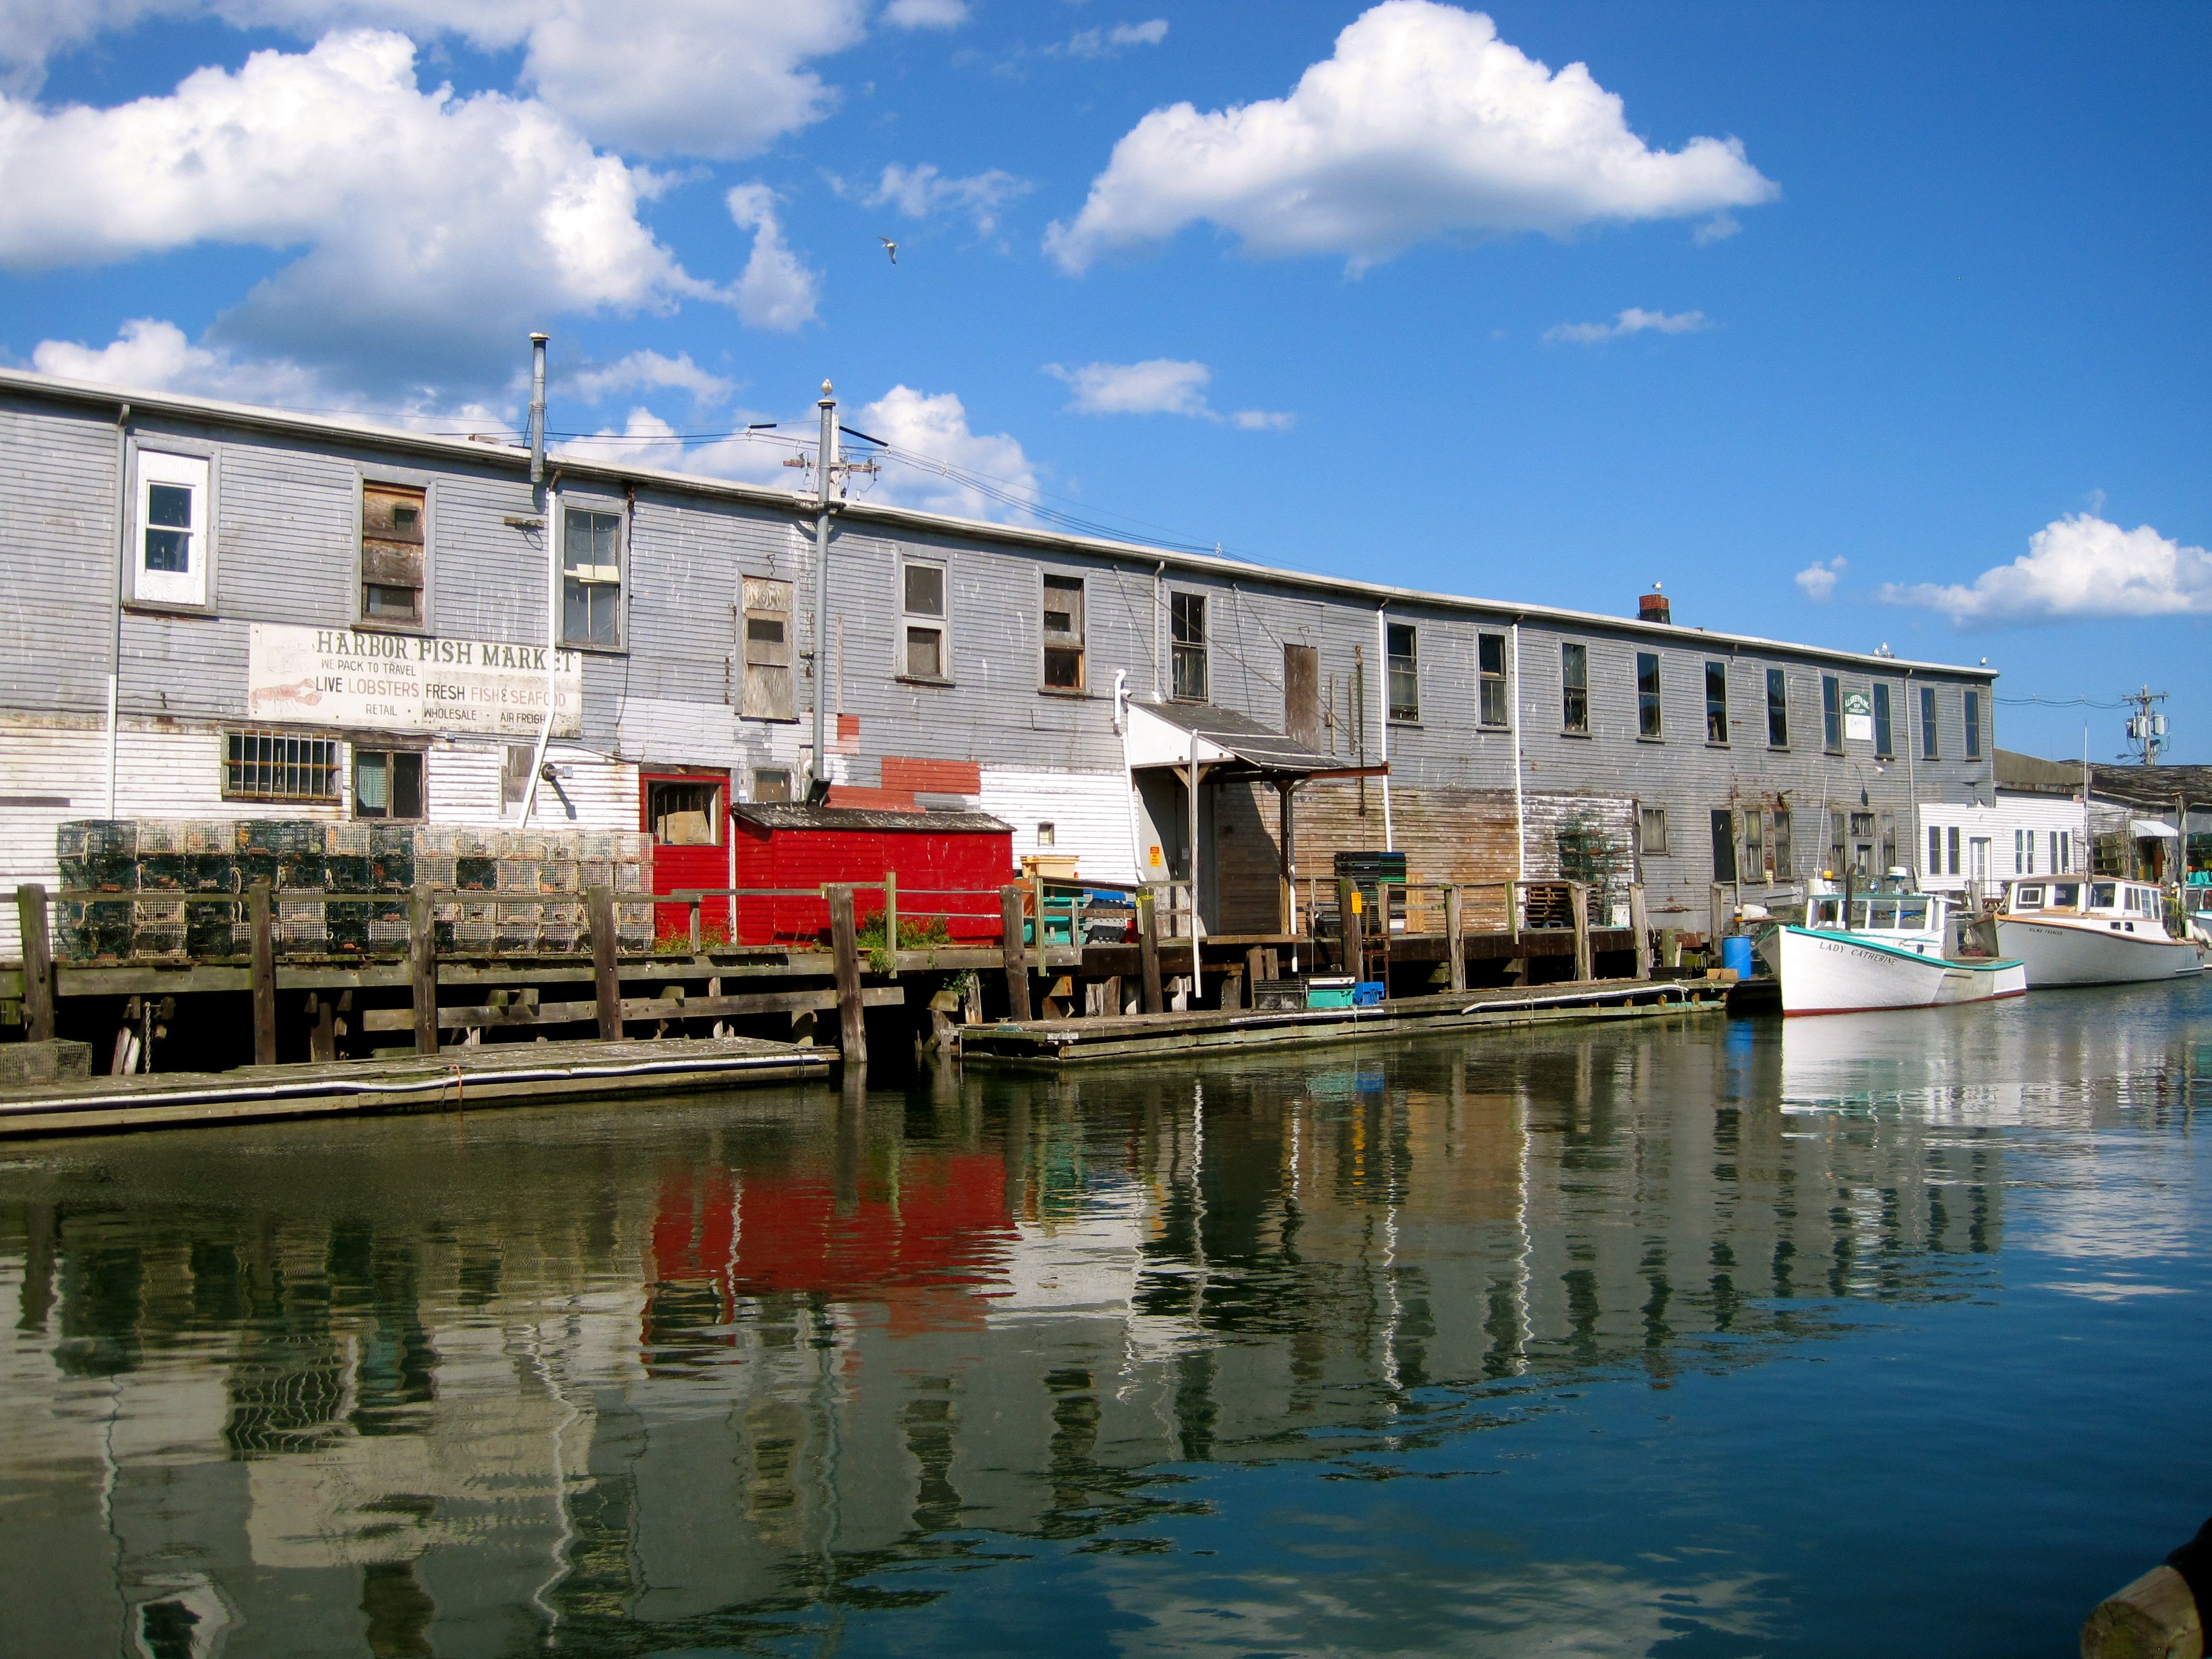 Northern exposure portland inspiration files for Harbor fish market portland maine